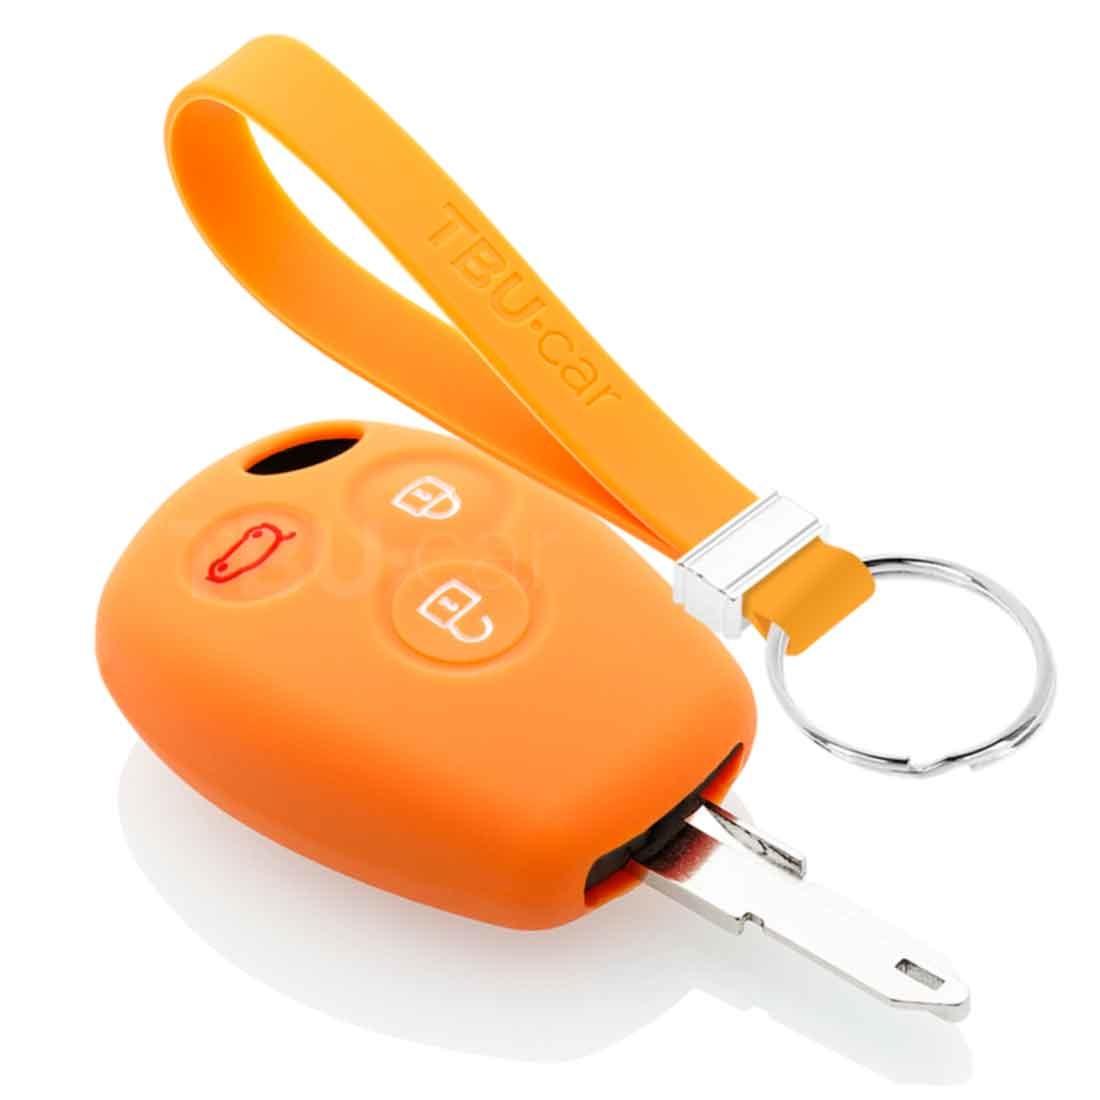 TBU car TBU car Funda Carcasa llave compatible con Dacia - Funda de Silicona - Cover de Llave Coche - Naranja